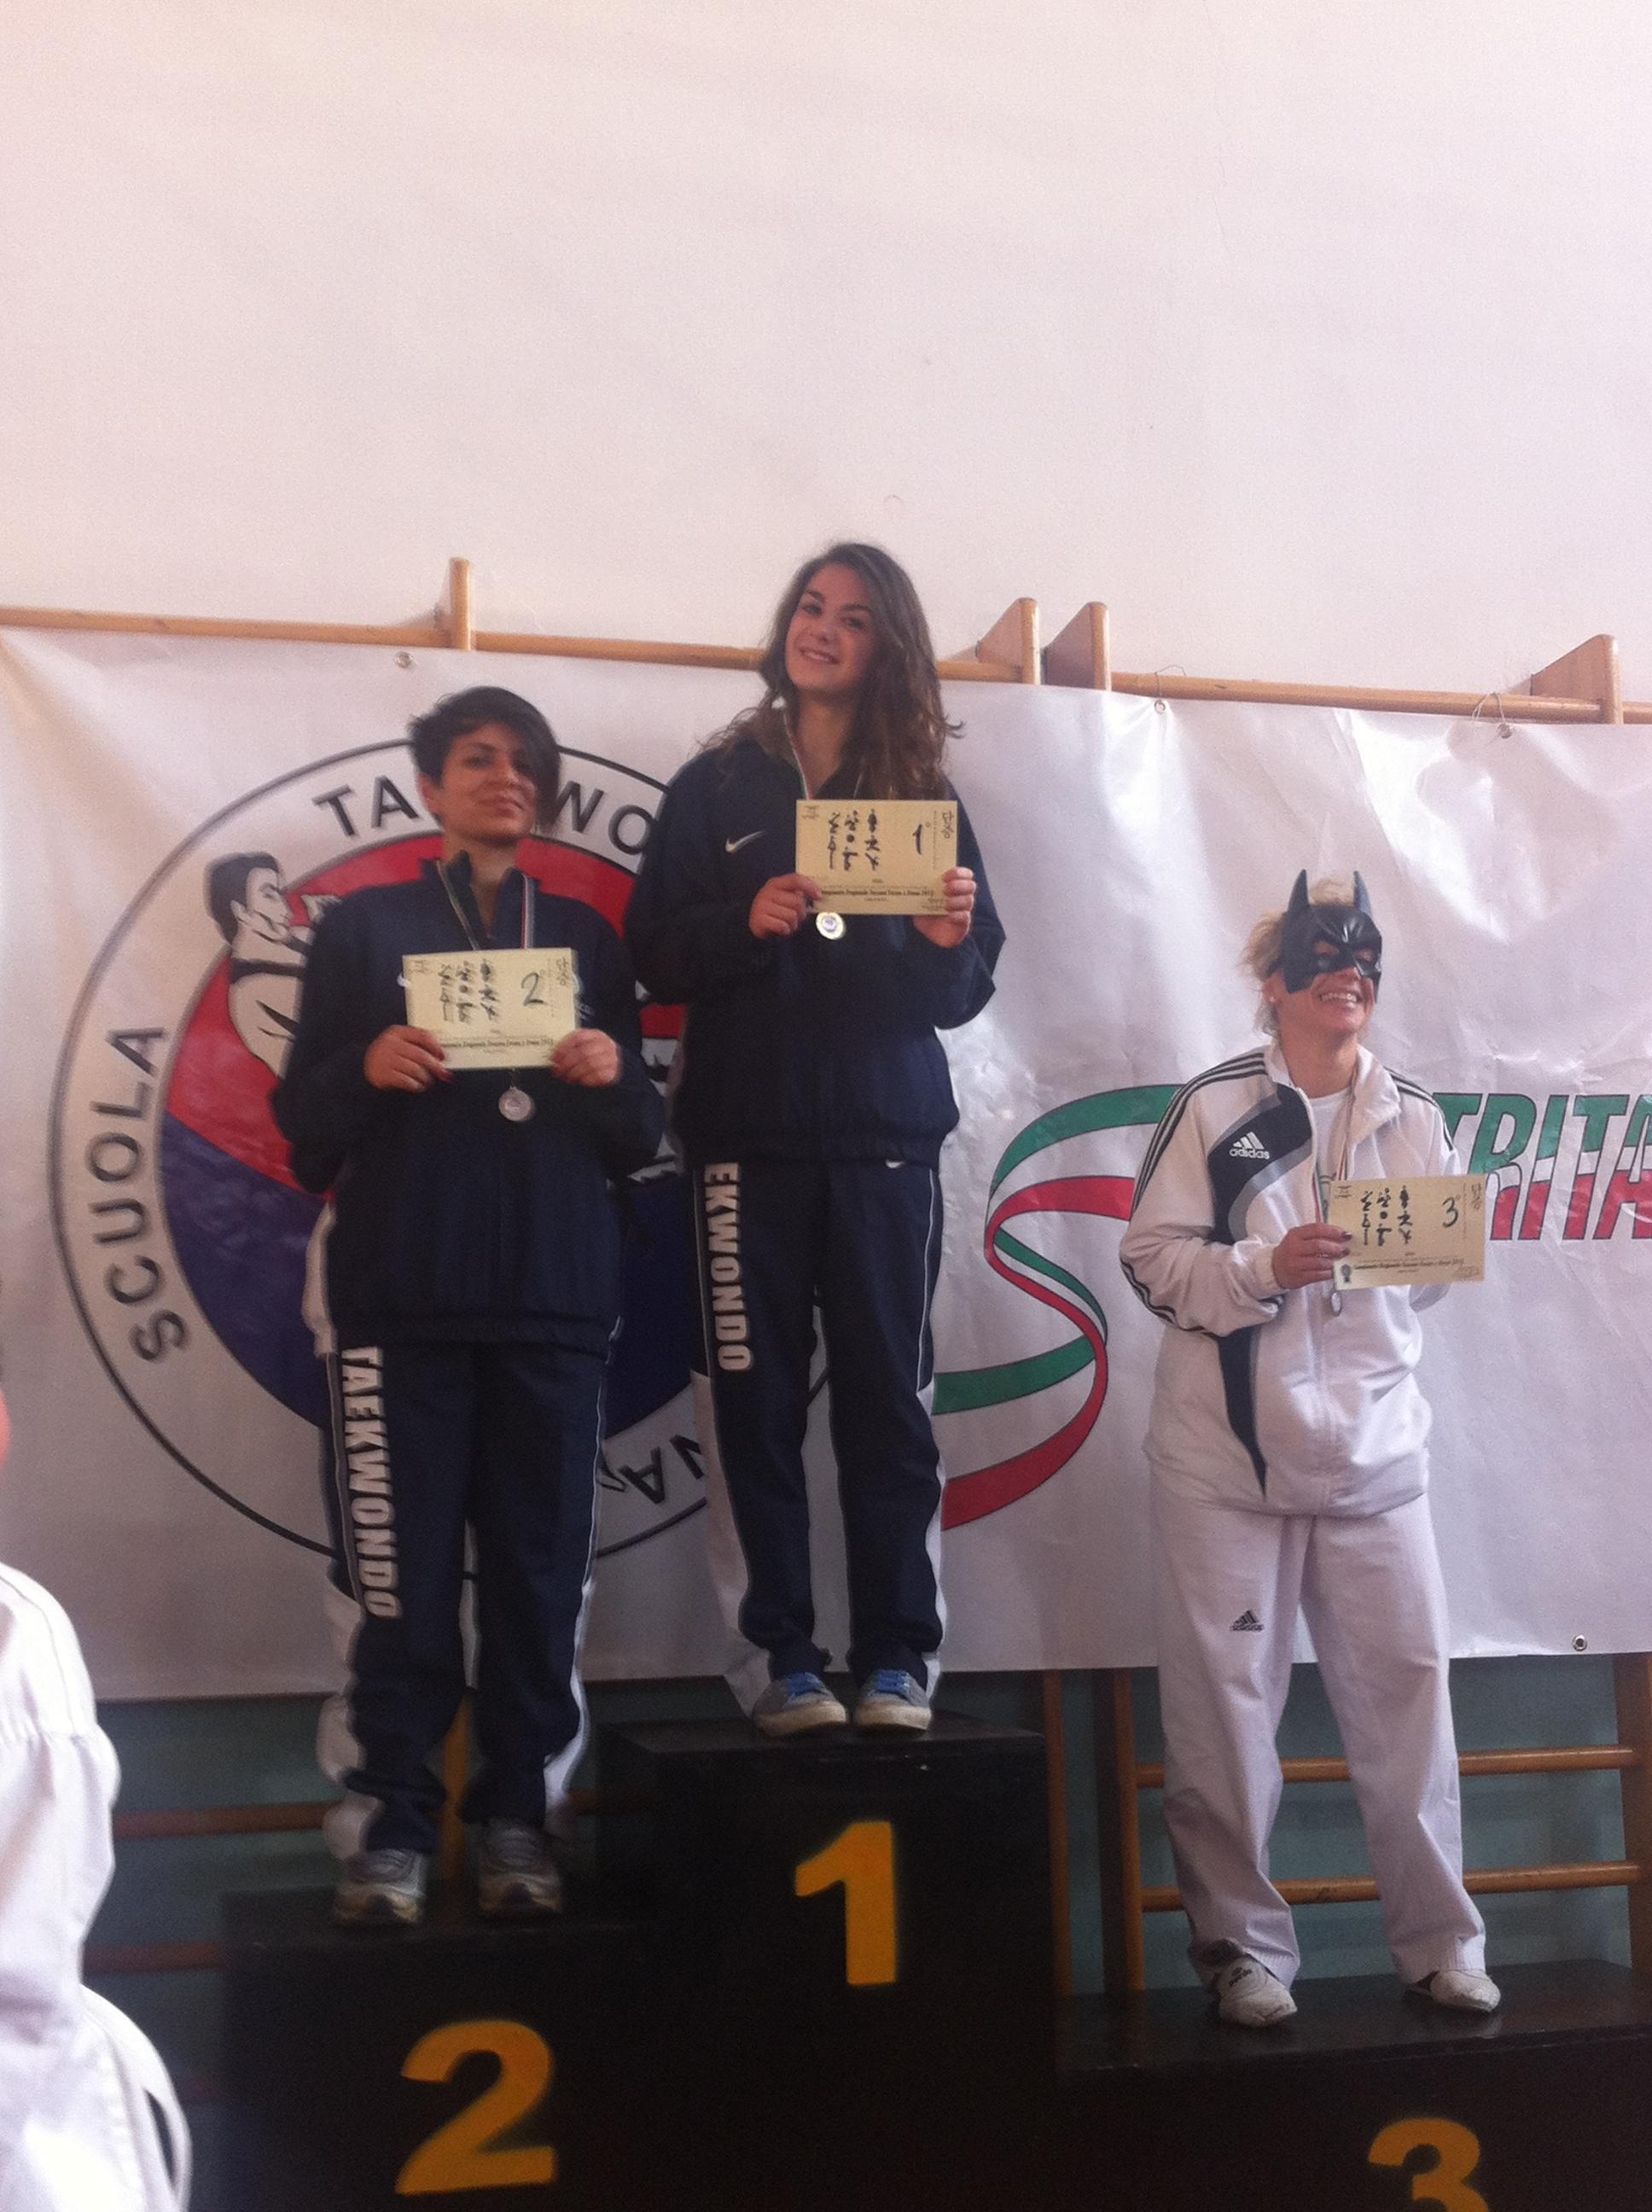 La Kouros Taekwondo fa incetta di medaglie ai campionati regionali